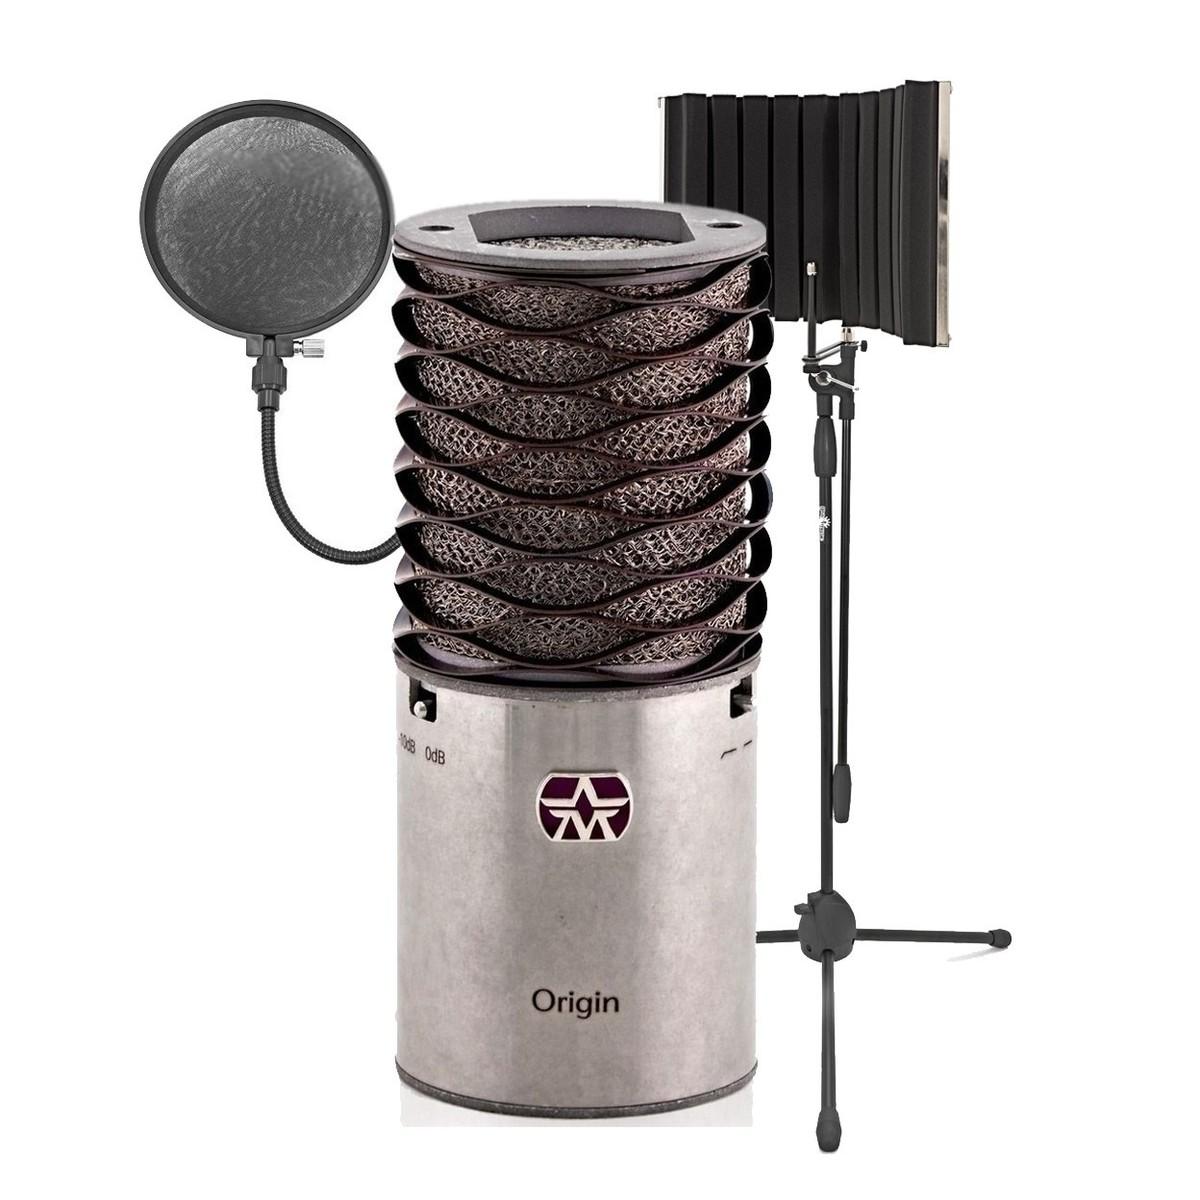 4Sound. Shure mikrofon vokal kardioide med stativ